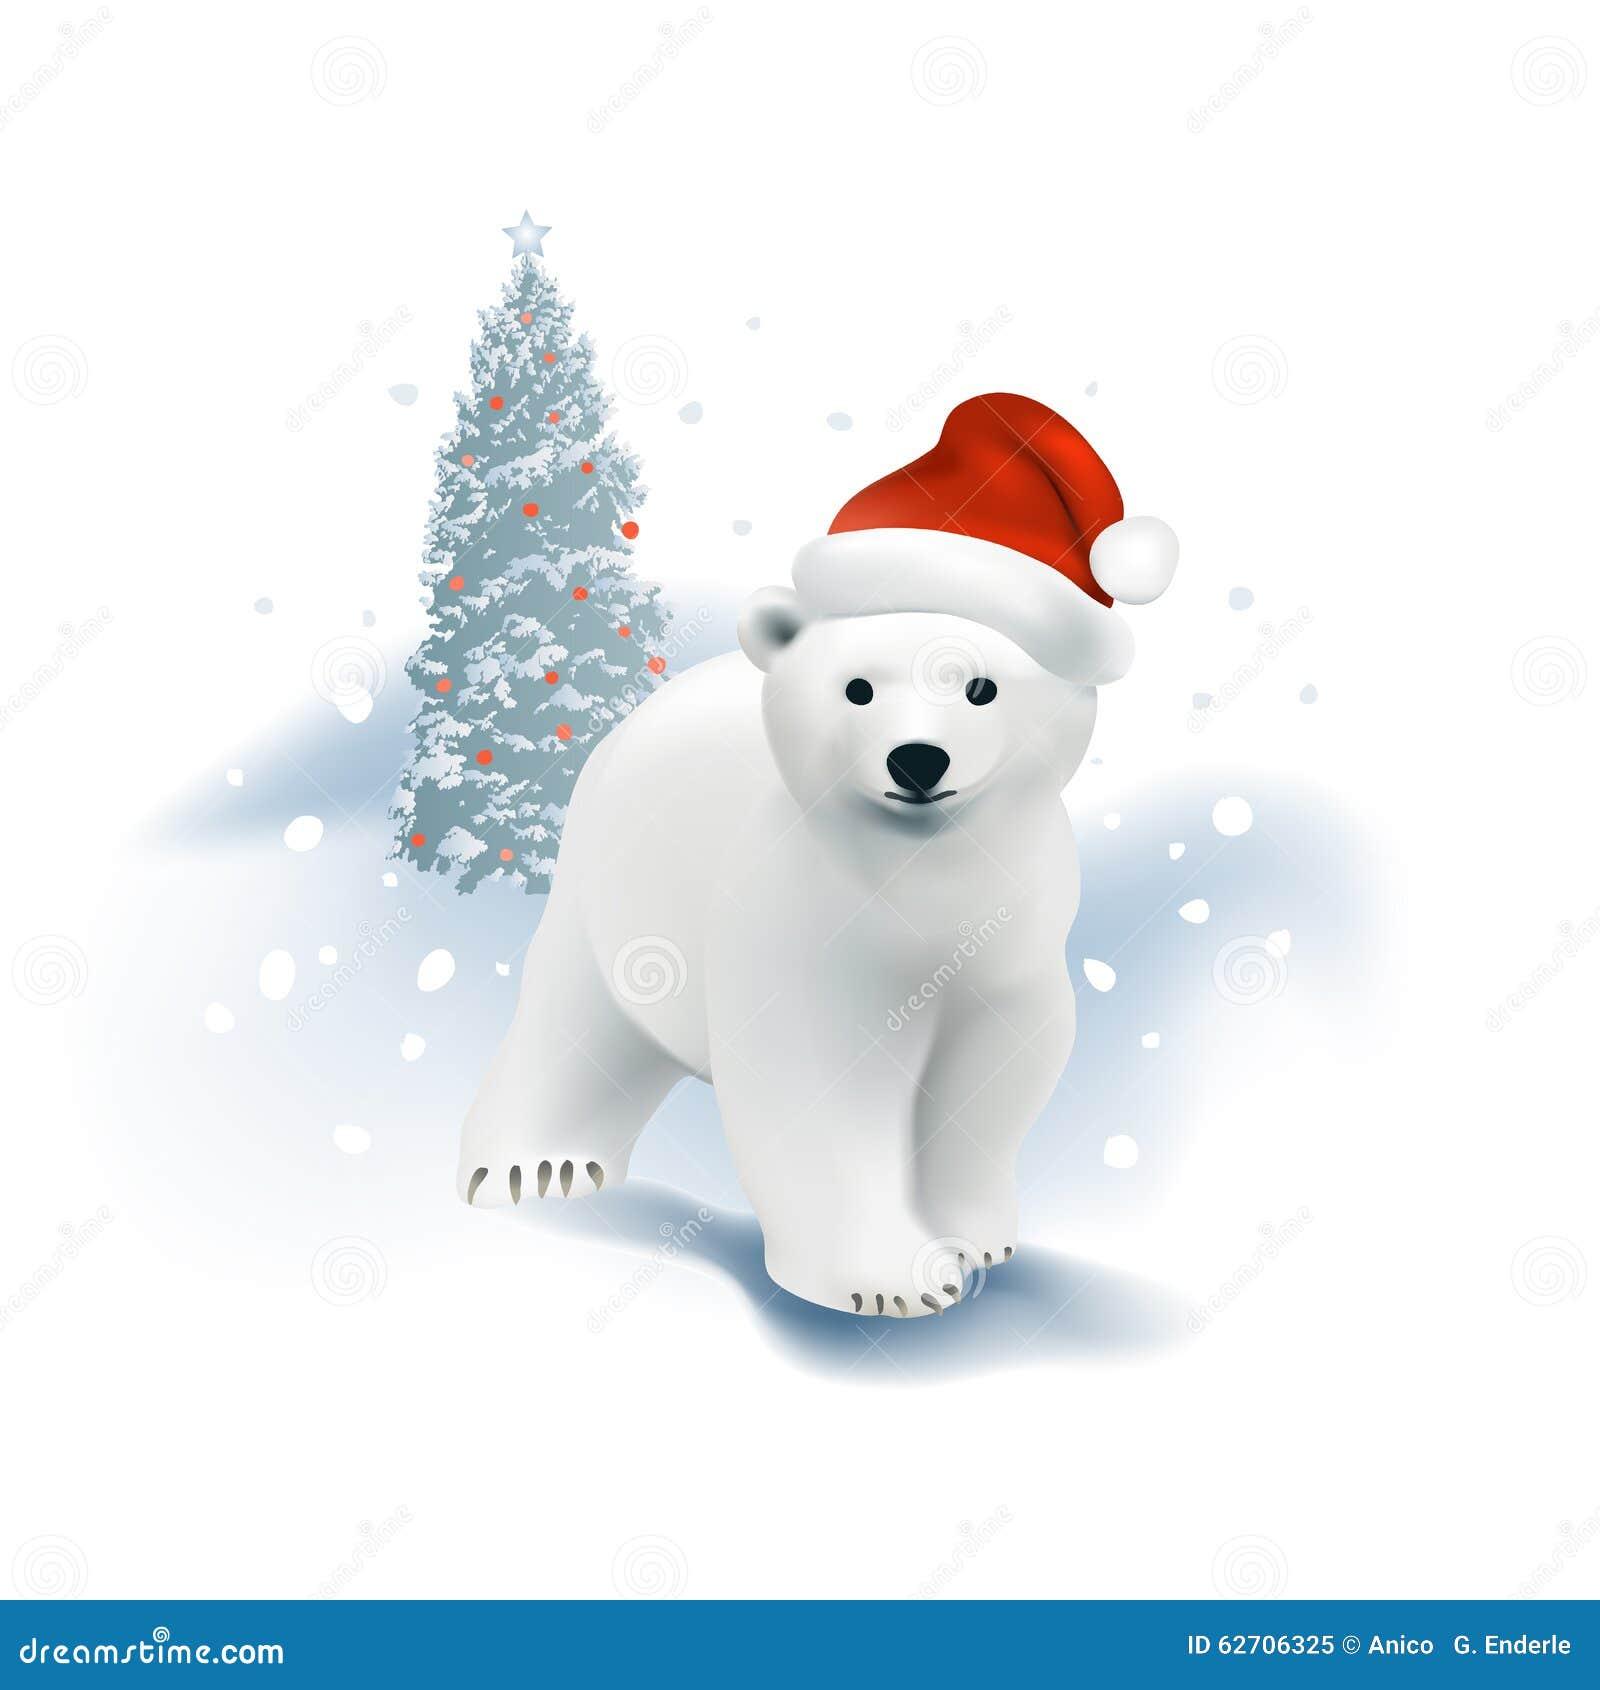 Cub πολικών αρκουδών με το καπέλο Santa και το χριστουγεννιάτικο δέντρο